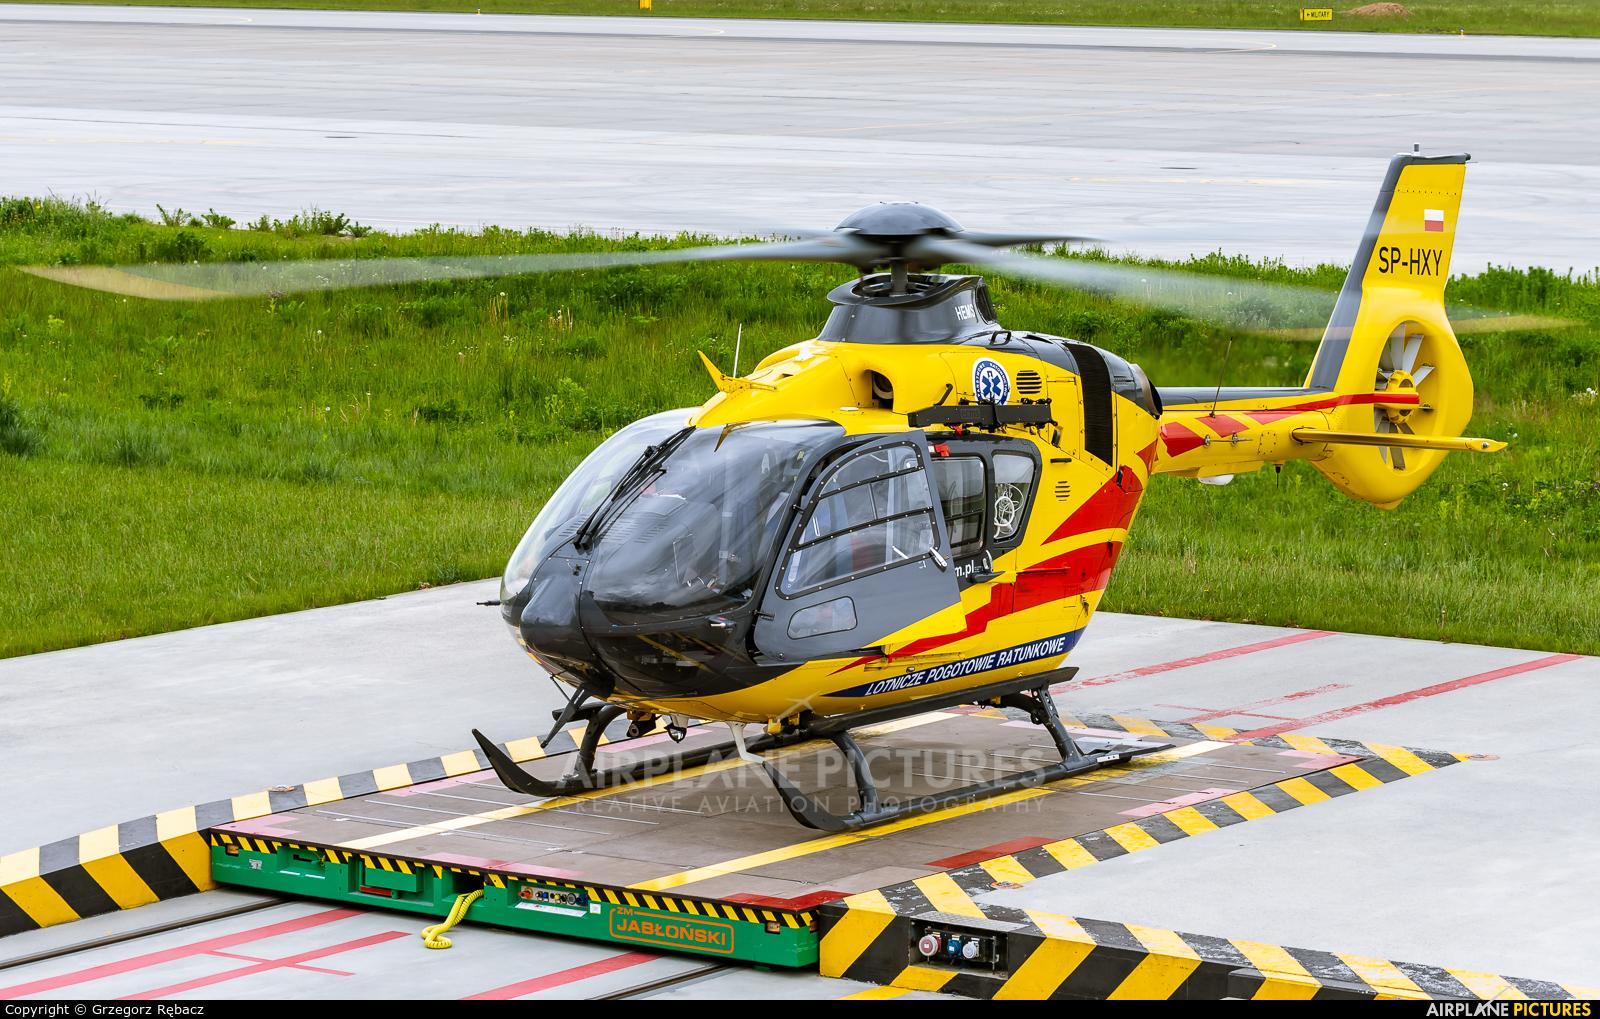 Polish Medical Air Rescue - Lotnicze Pogotowie Ratunkowe SP-HXY aircraft at Kraków - John Paul II Intl